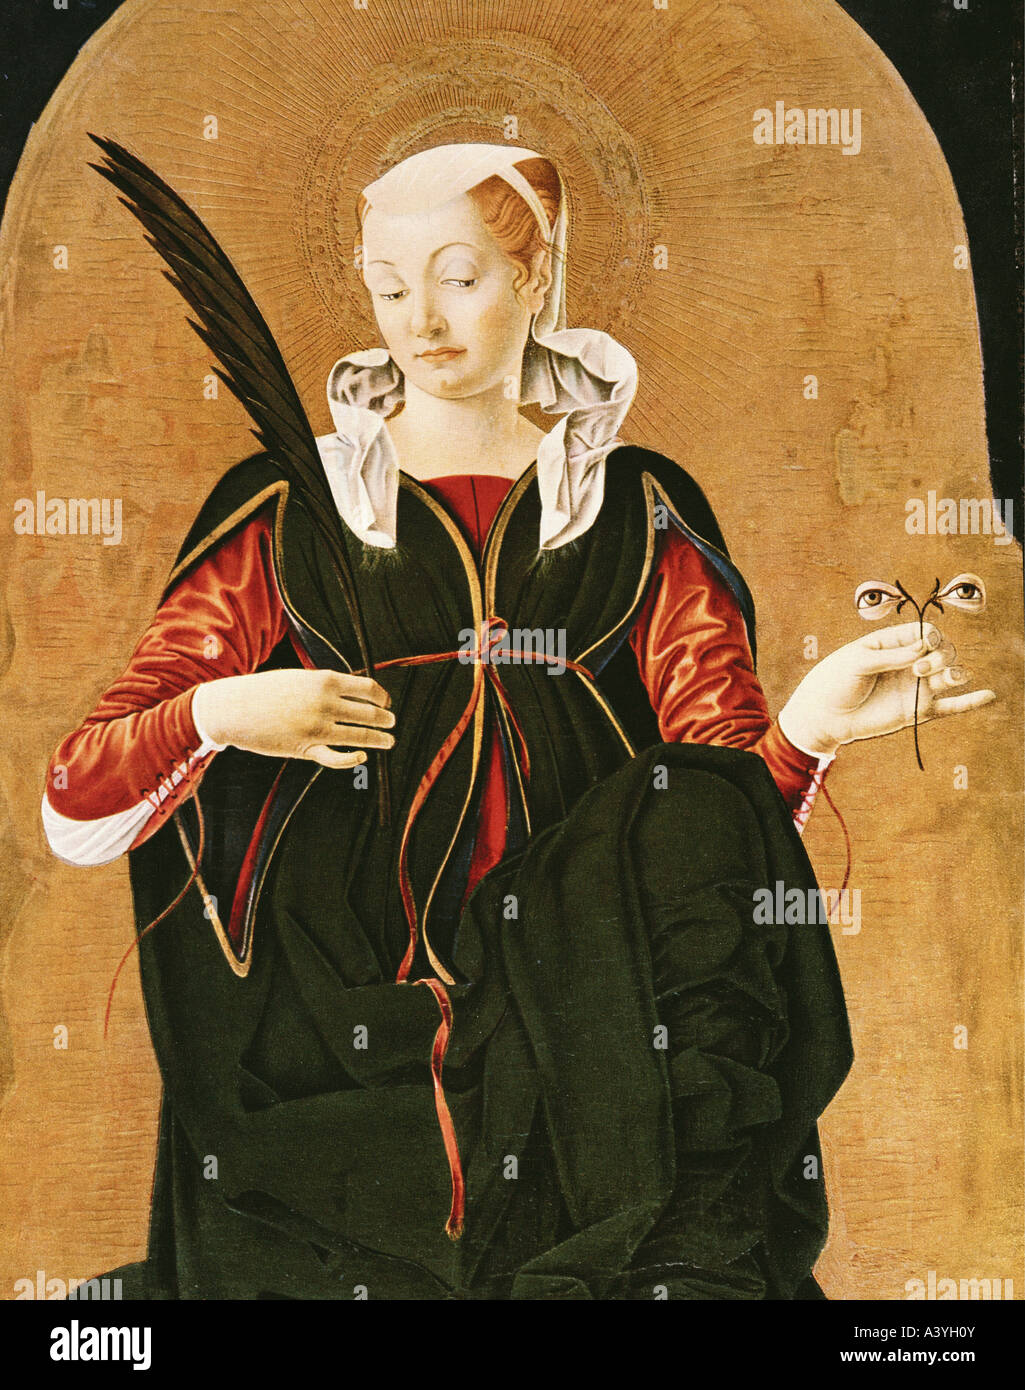 """Fine Arts, Cossa, Francesco del (ca. 1435 - ca. 1477), Malerei, 'Lucia', 1474, Öl auf Platte, Stockbild"